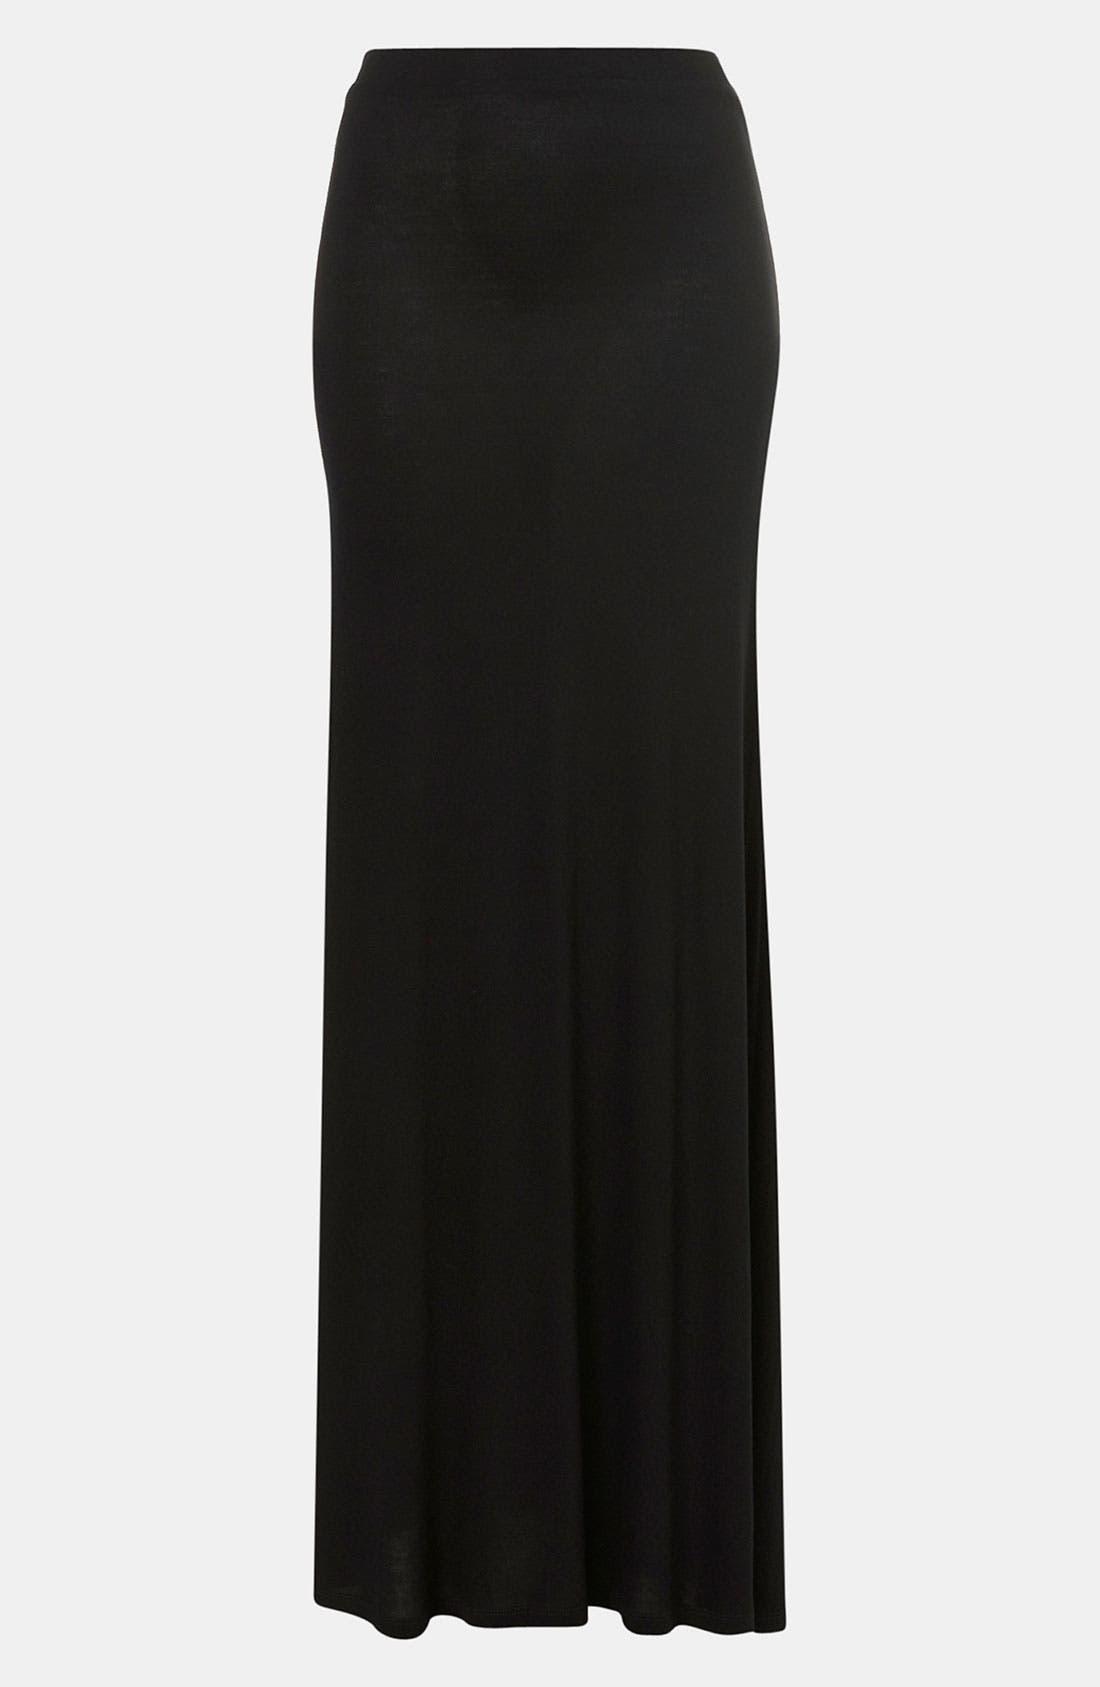 Main Image - Topshop Maxi Skirt